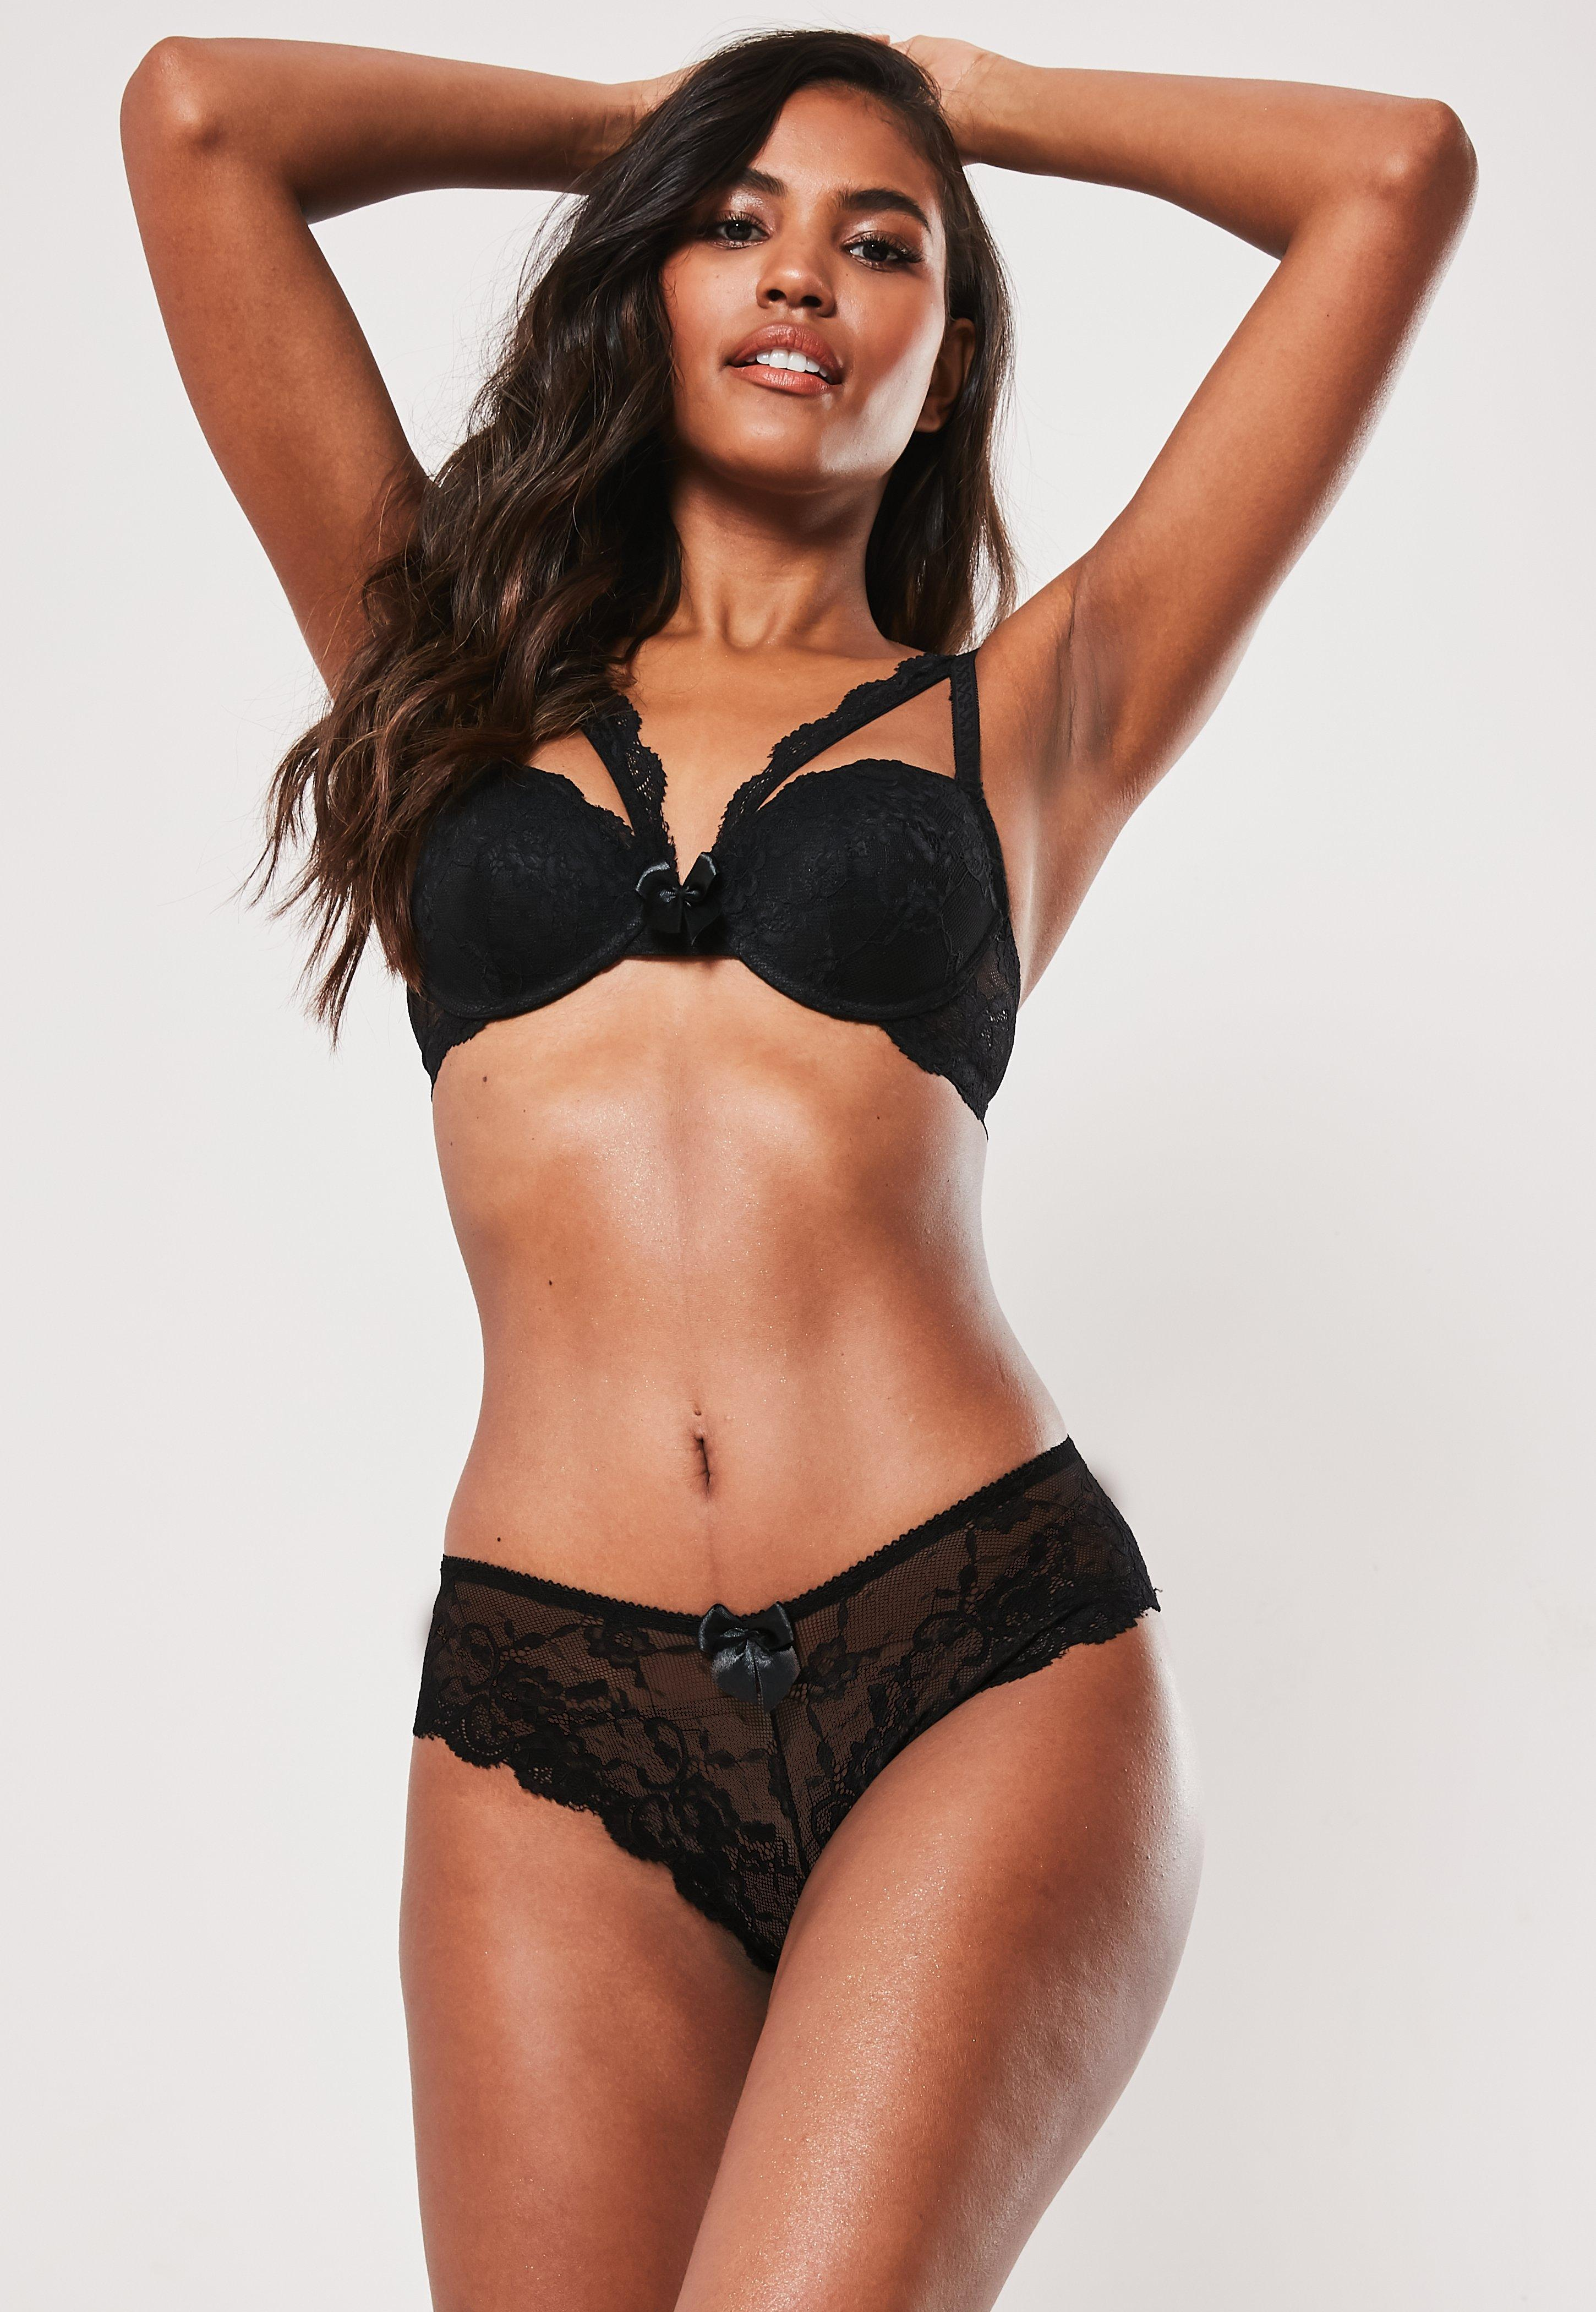 f56066f7c3a0 Women's Lingerie | Underwear & Lingerie Sets | Missguided